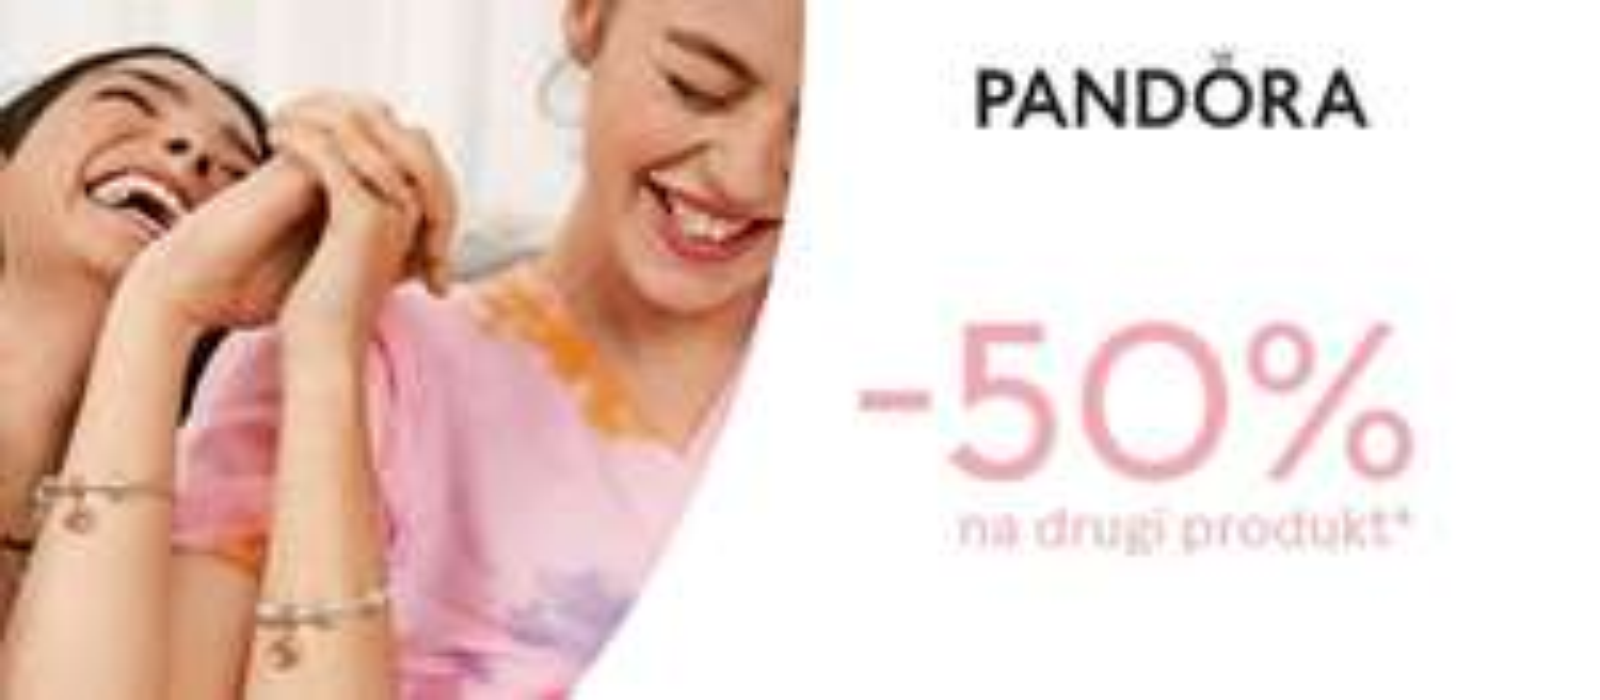 Biżuteria -50% na drugi produkt Pandora